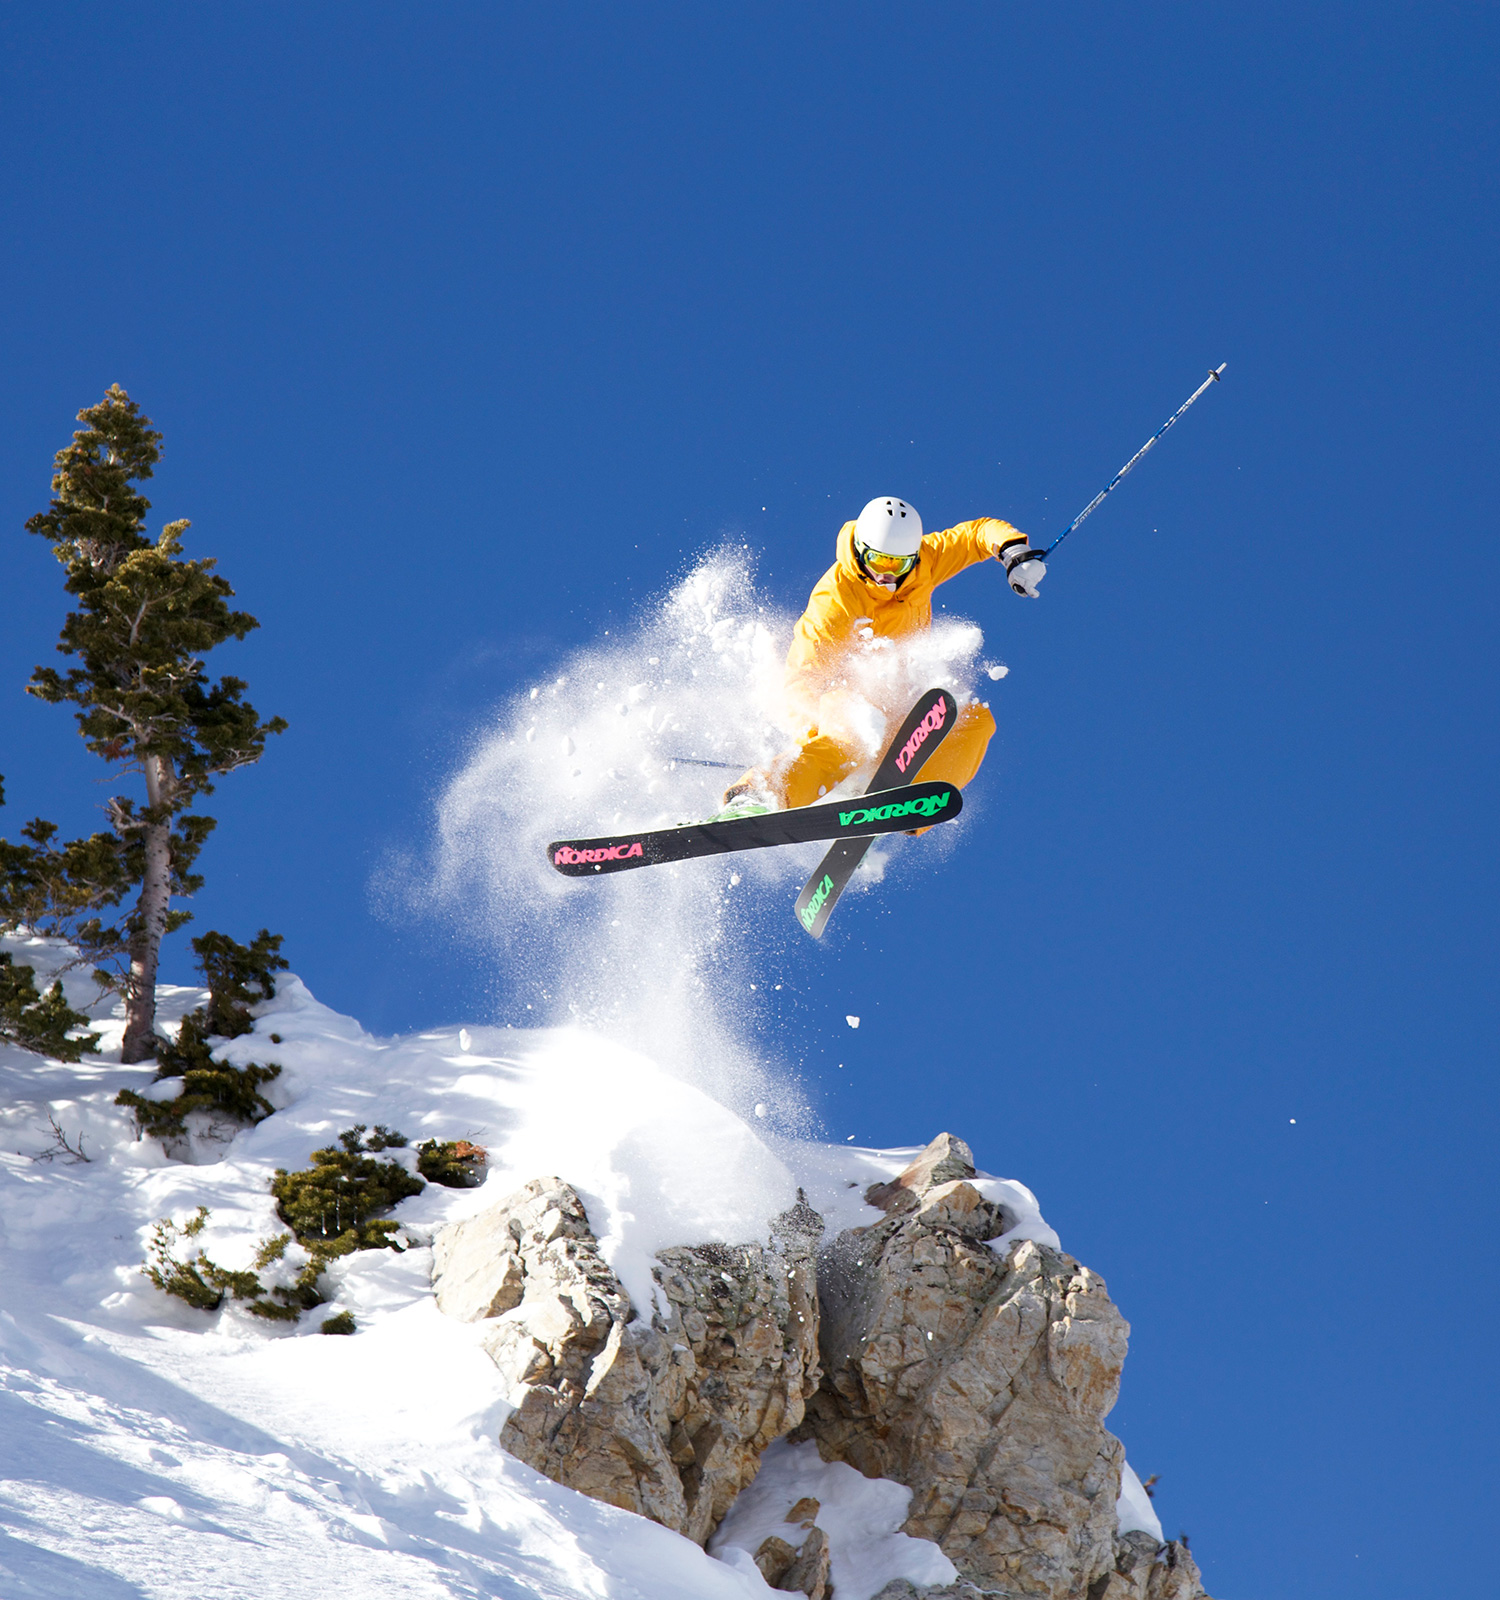 burke-alder-ski-cliff-picture.jpg